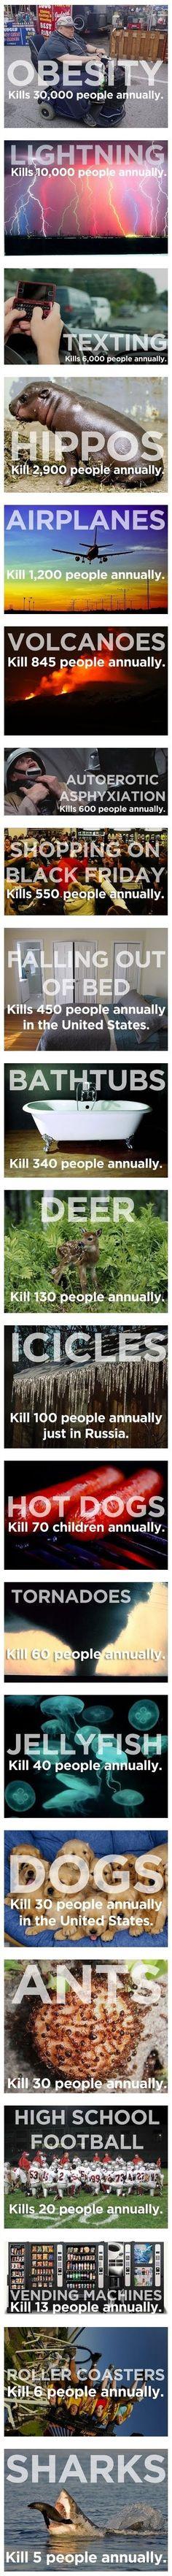 Things that kill more than shark